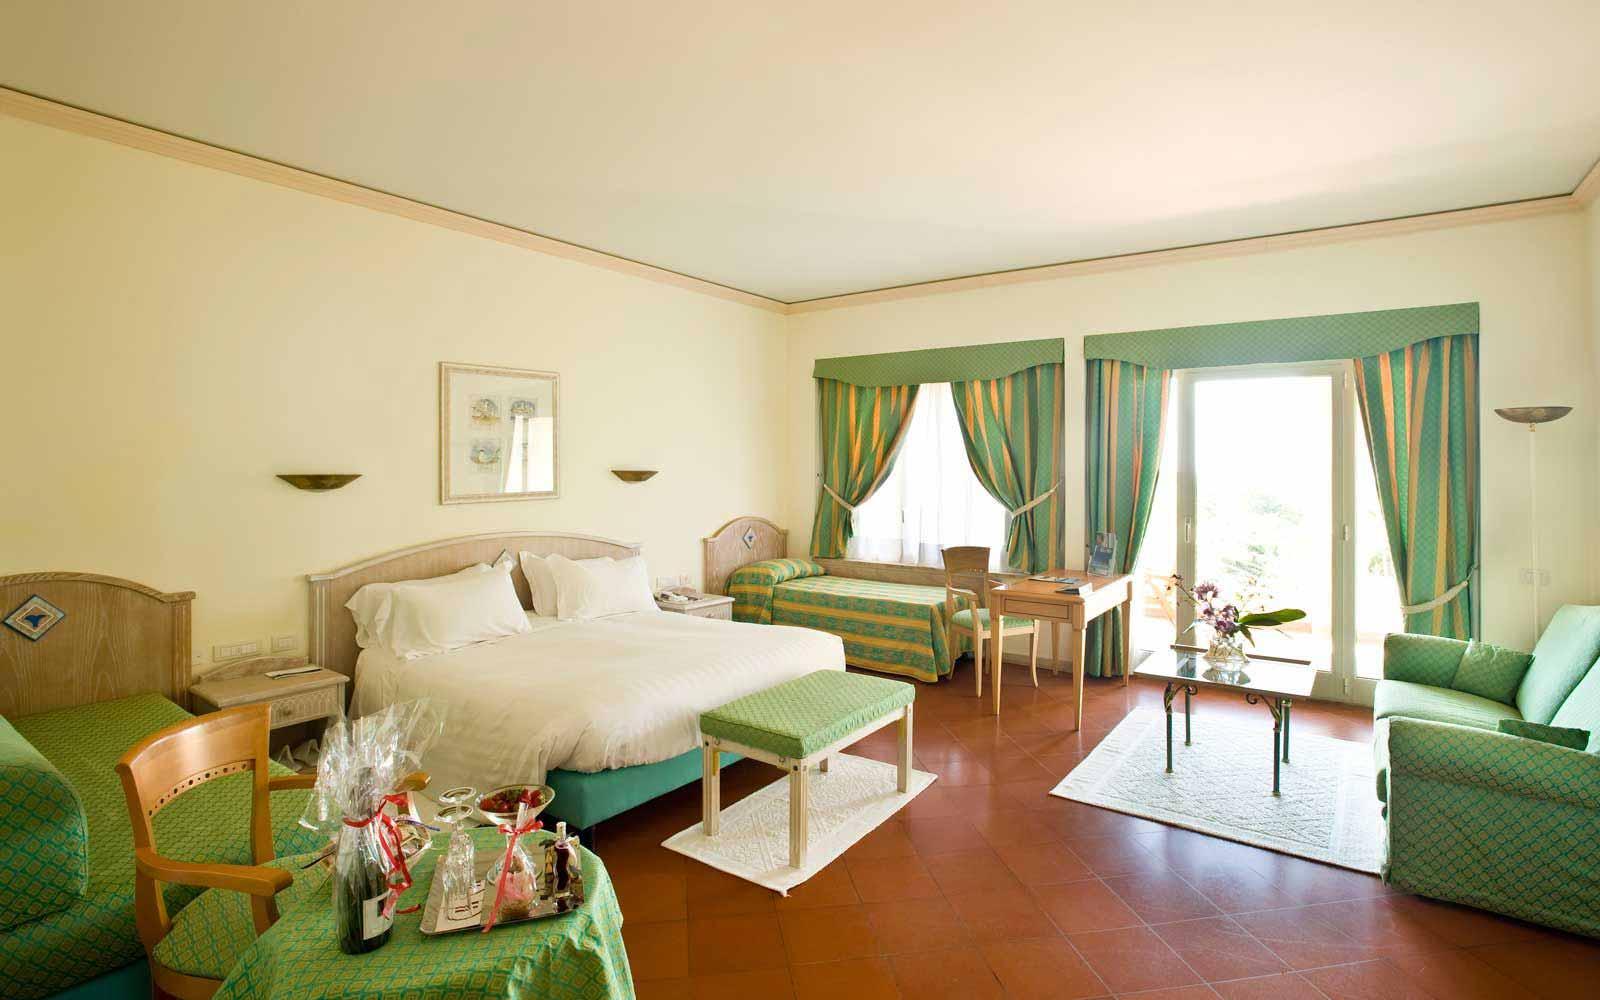 Deluxe room at Pullman Timi Ama Sardegna